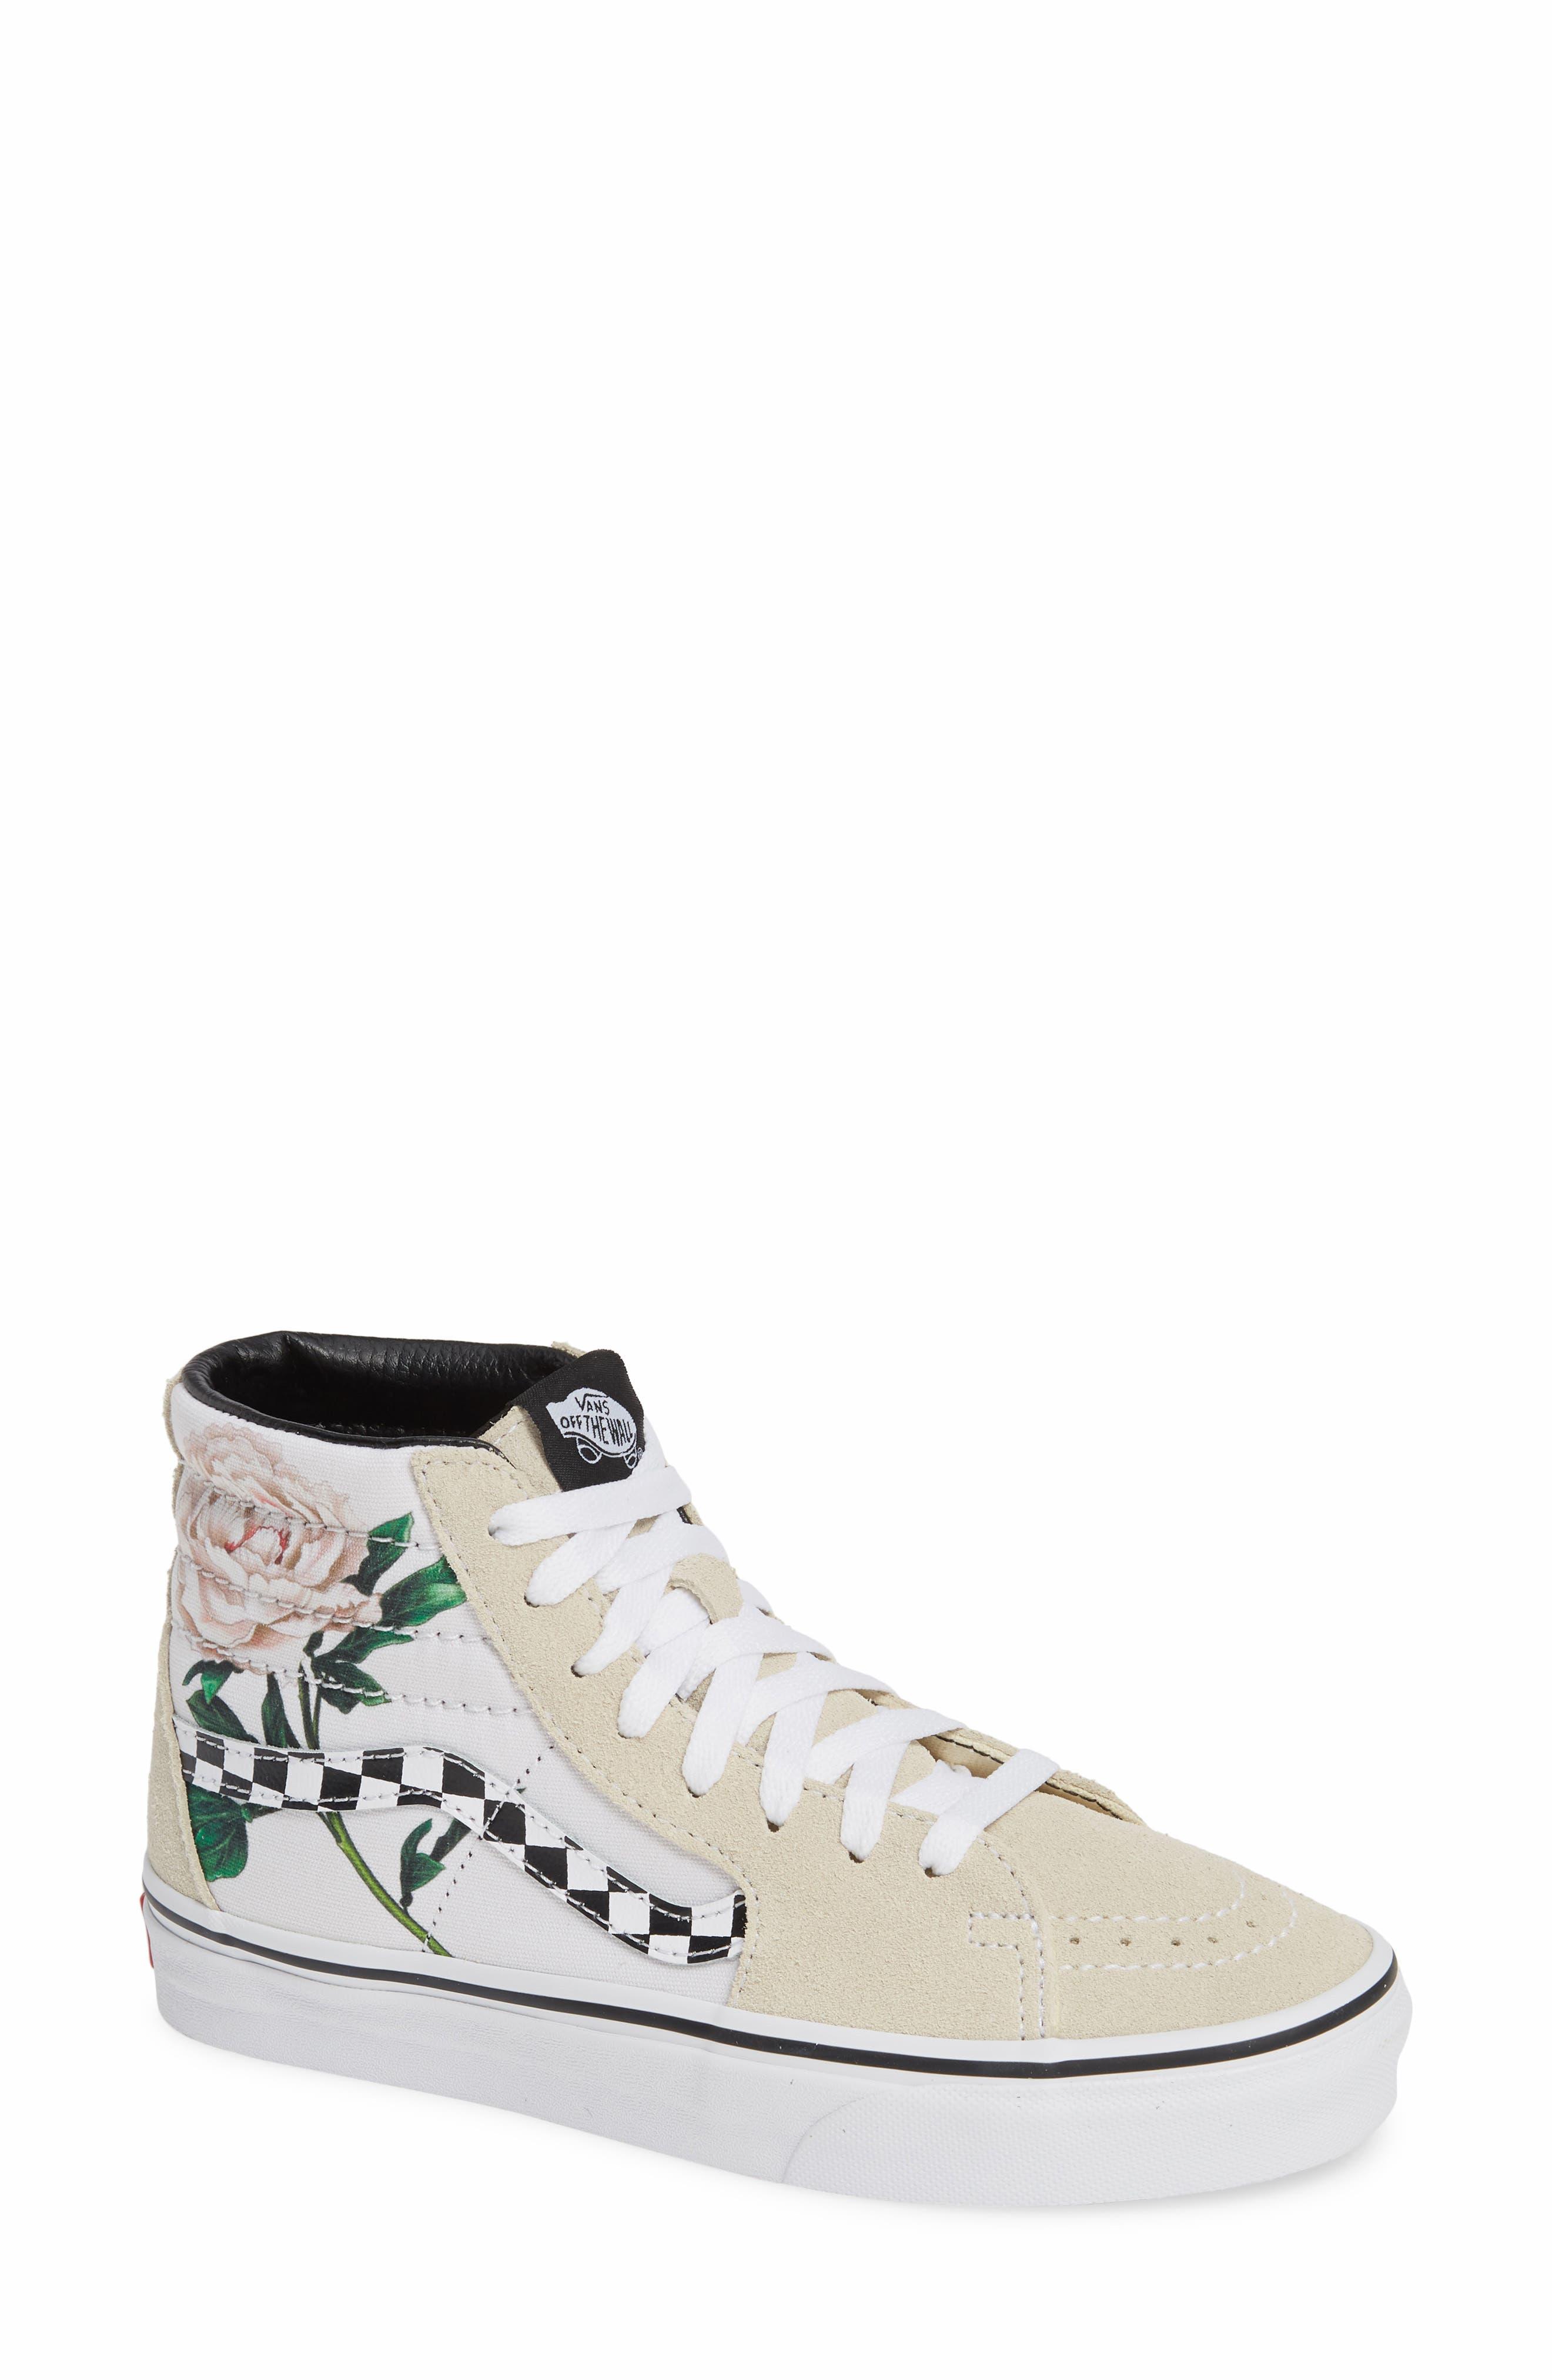 VANS Sk8-Hi Checker Floral High Top Sneaker, Main, color, CHECKER FLORAL TURTLEDOVE